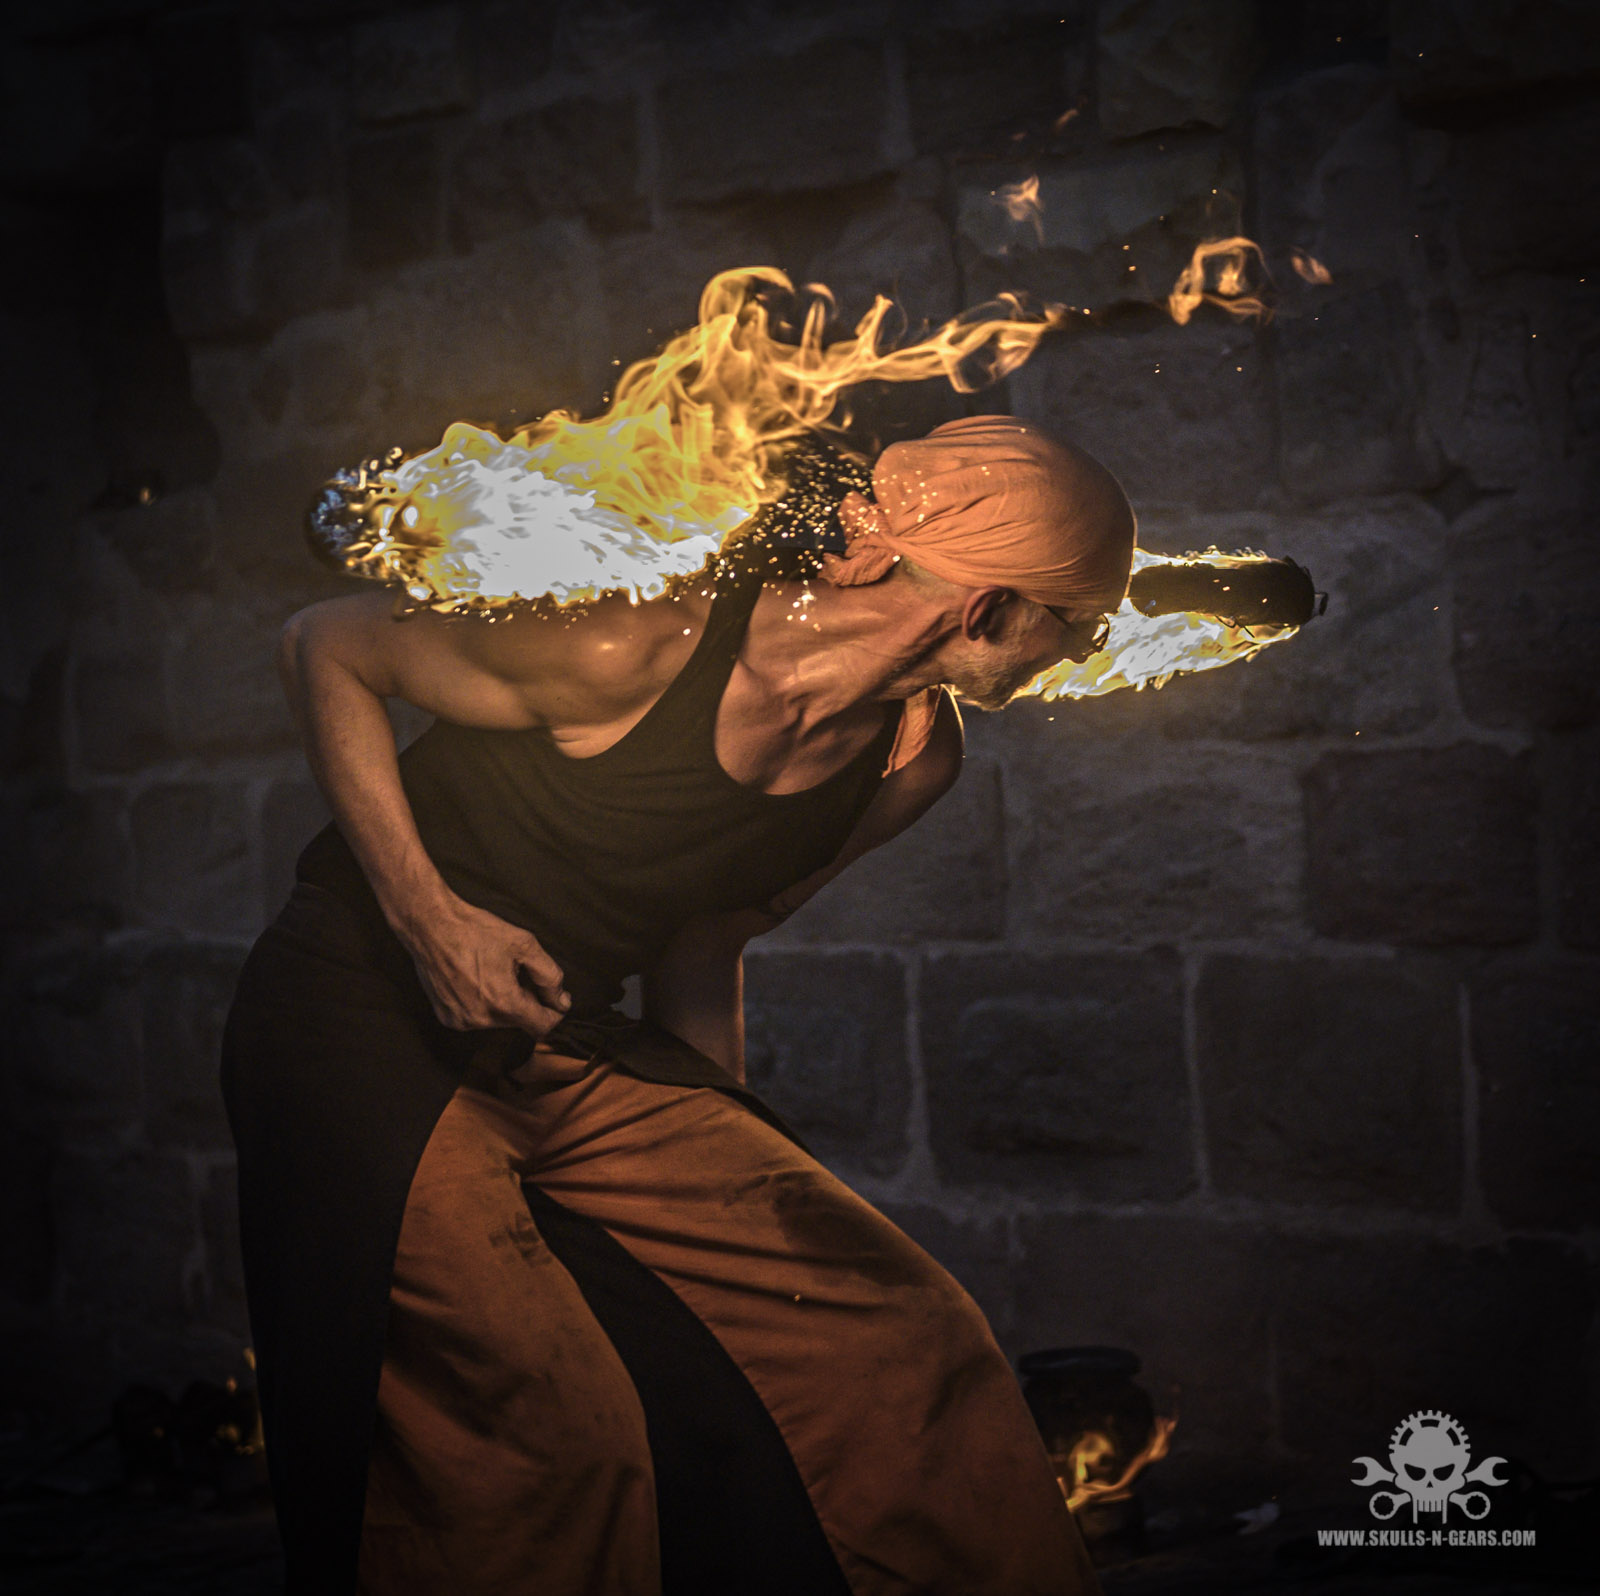 Feuertanz Festival 2019 - Feuershow-1178